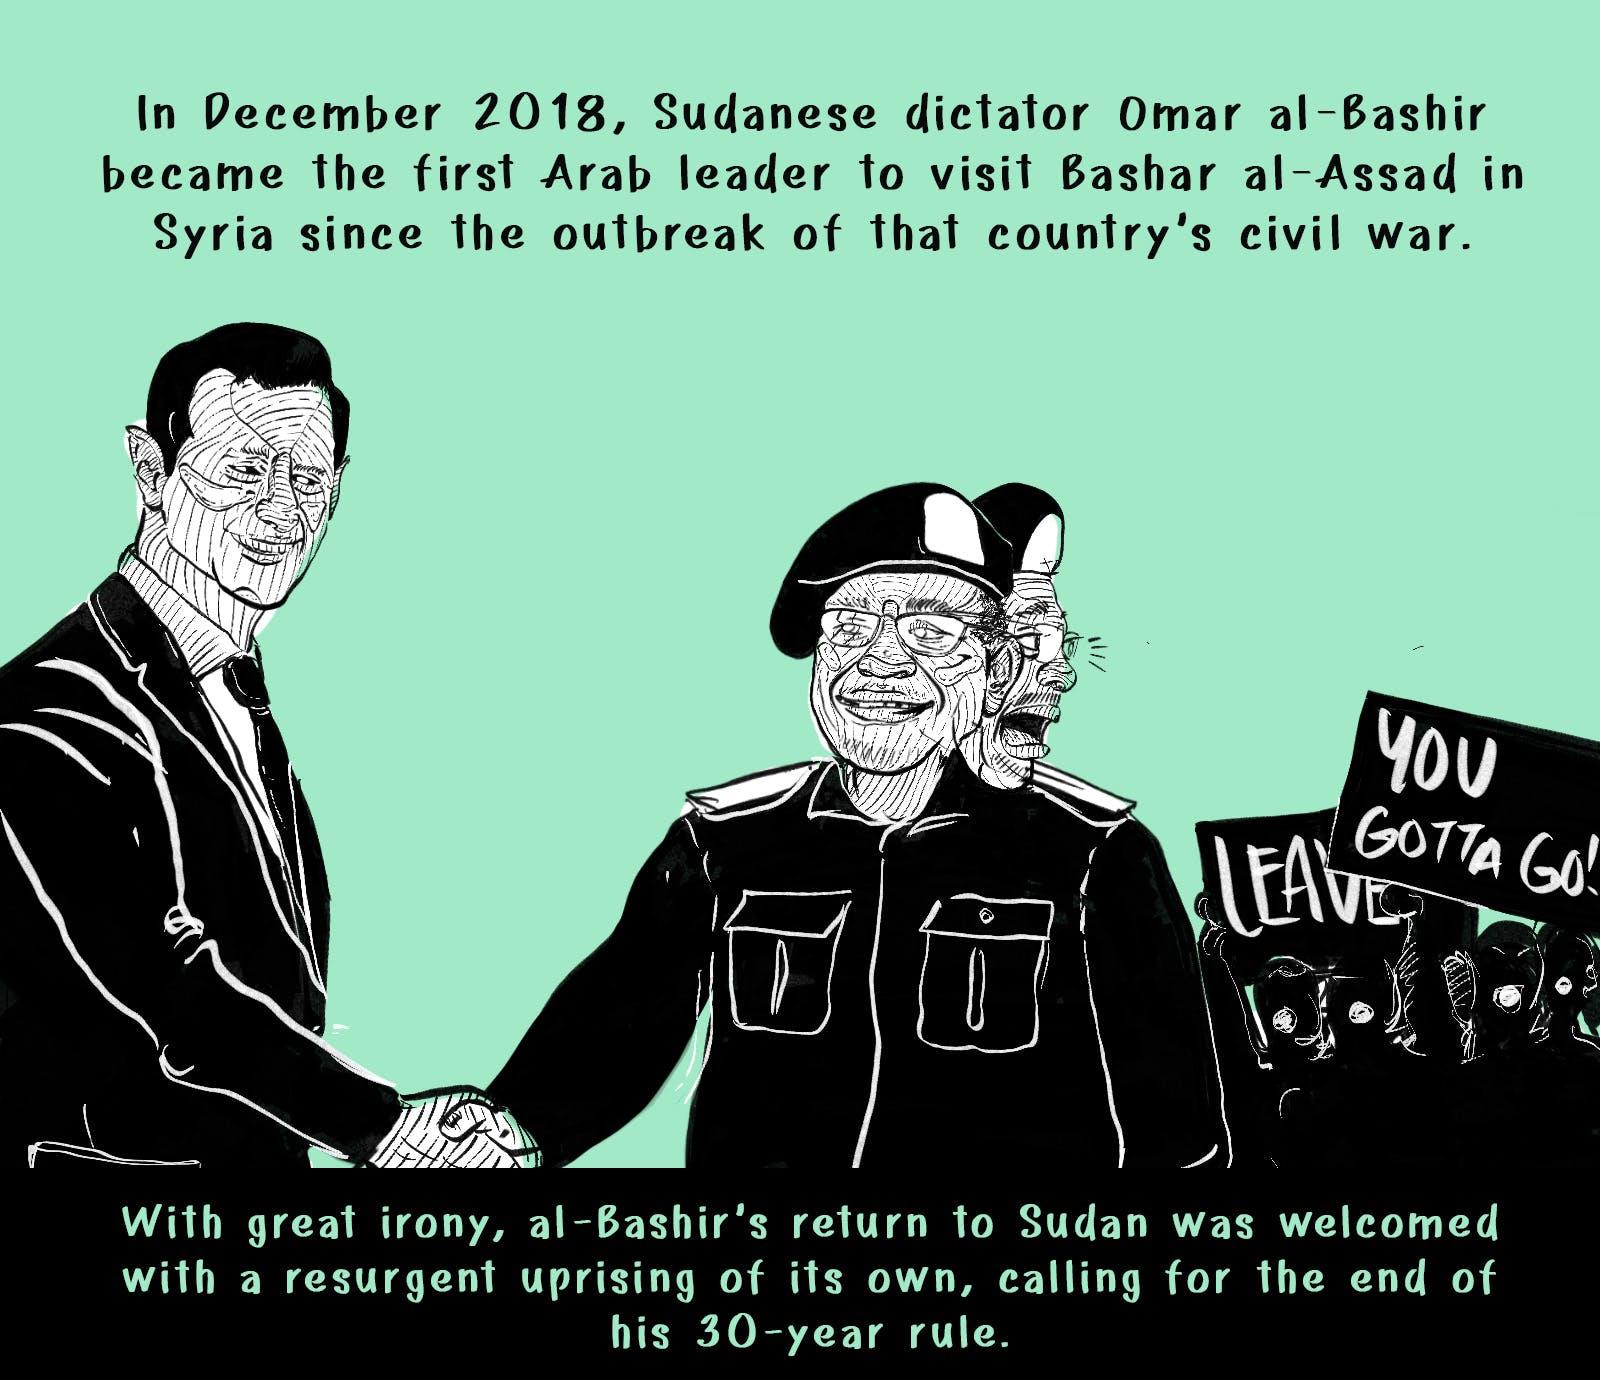 an-uprising-in-sudan-001-7ce